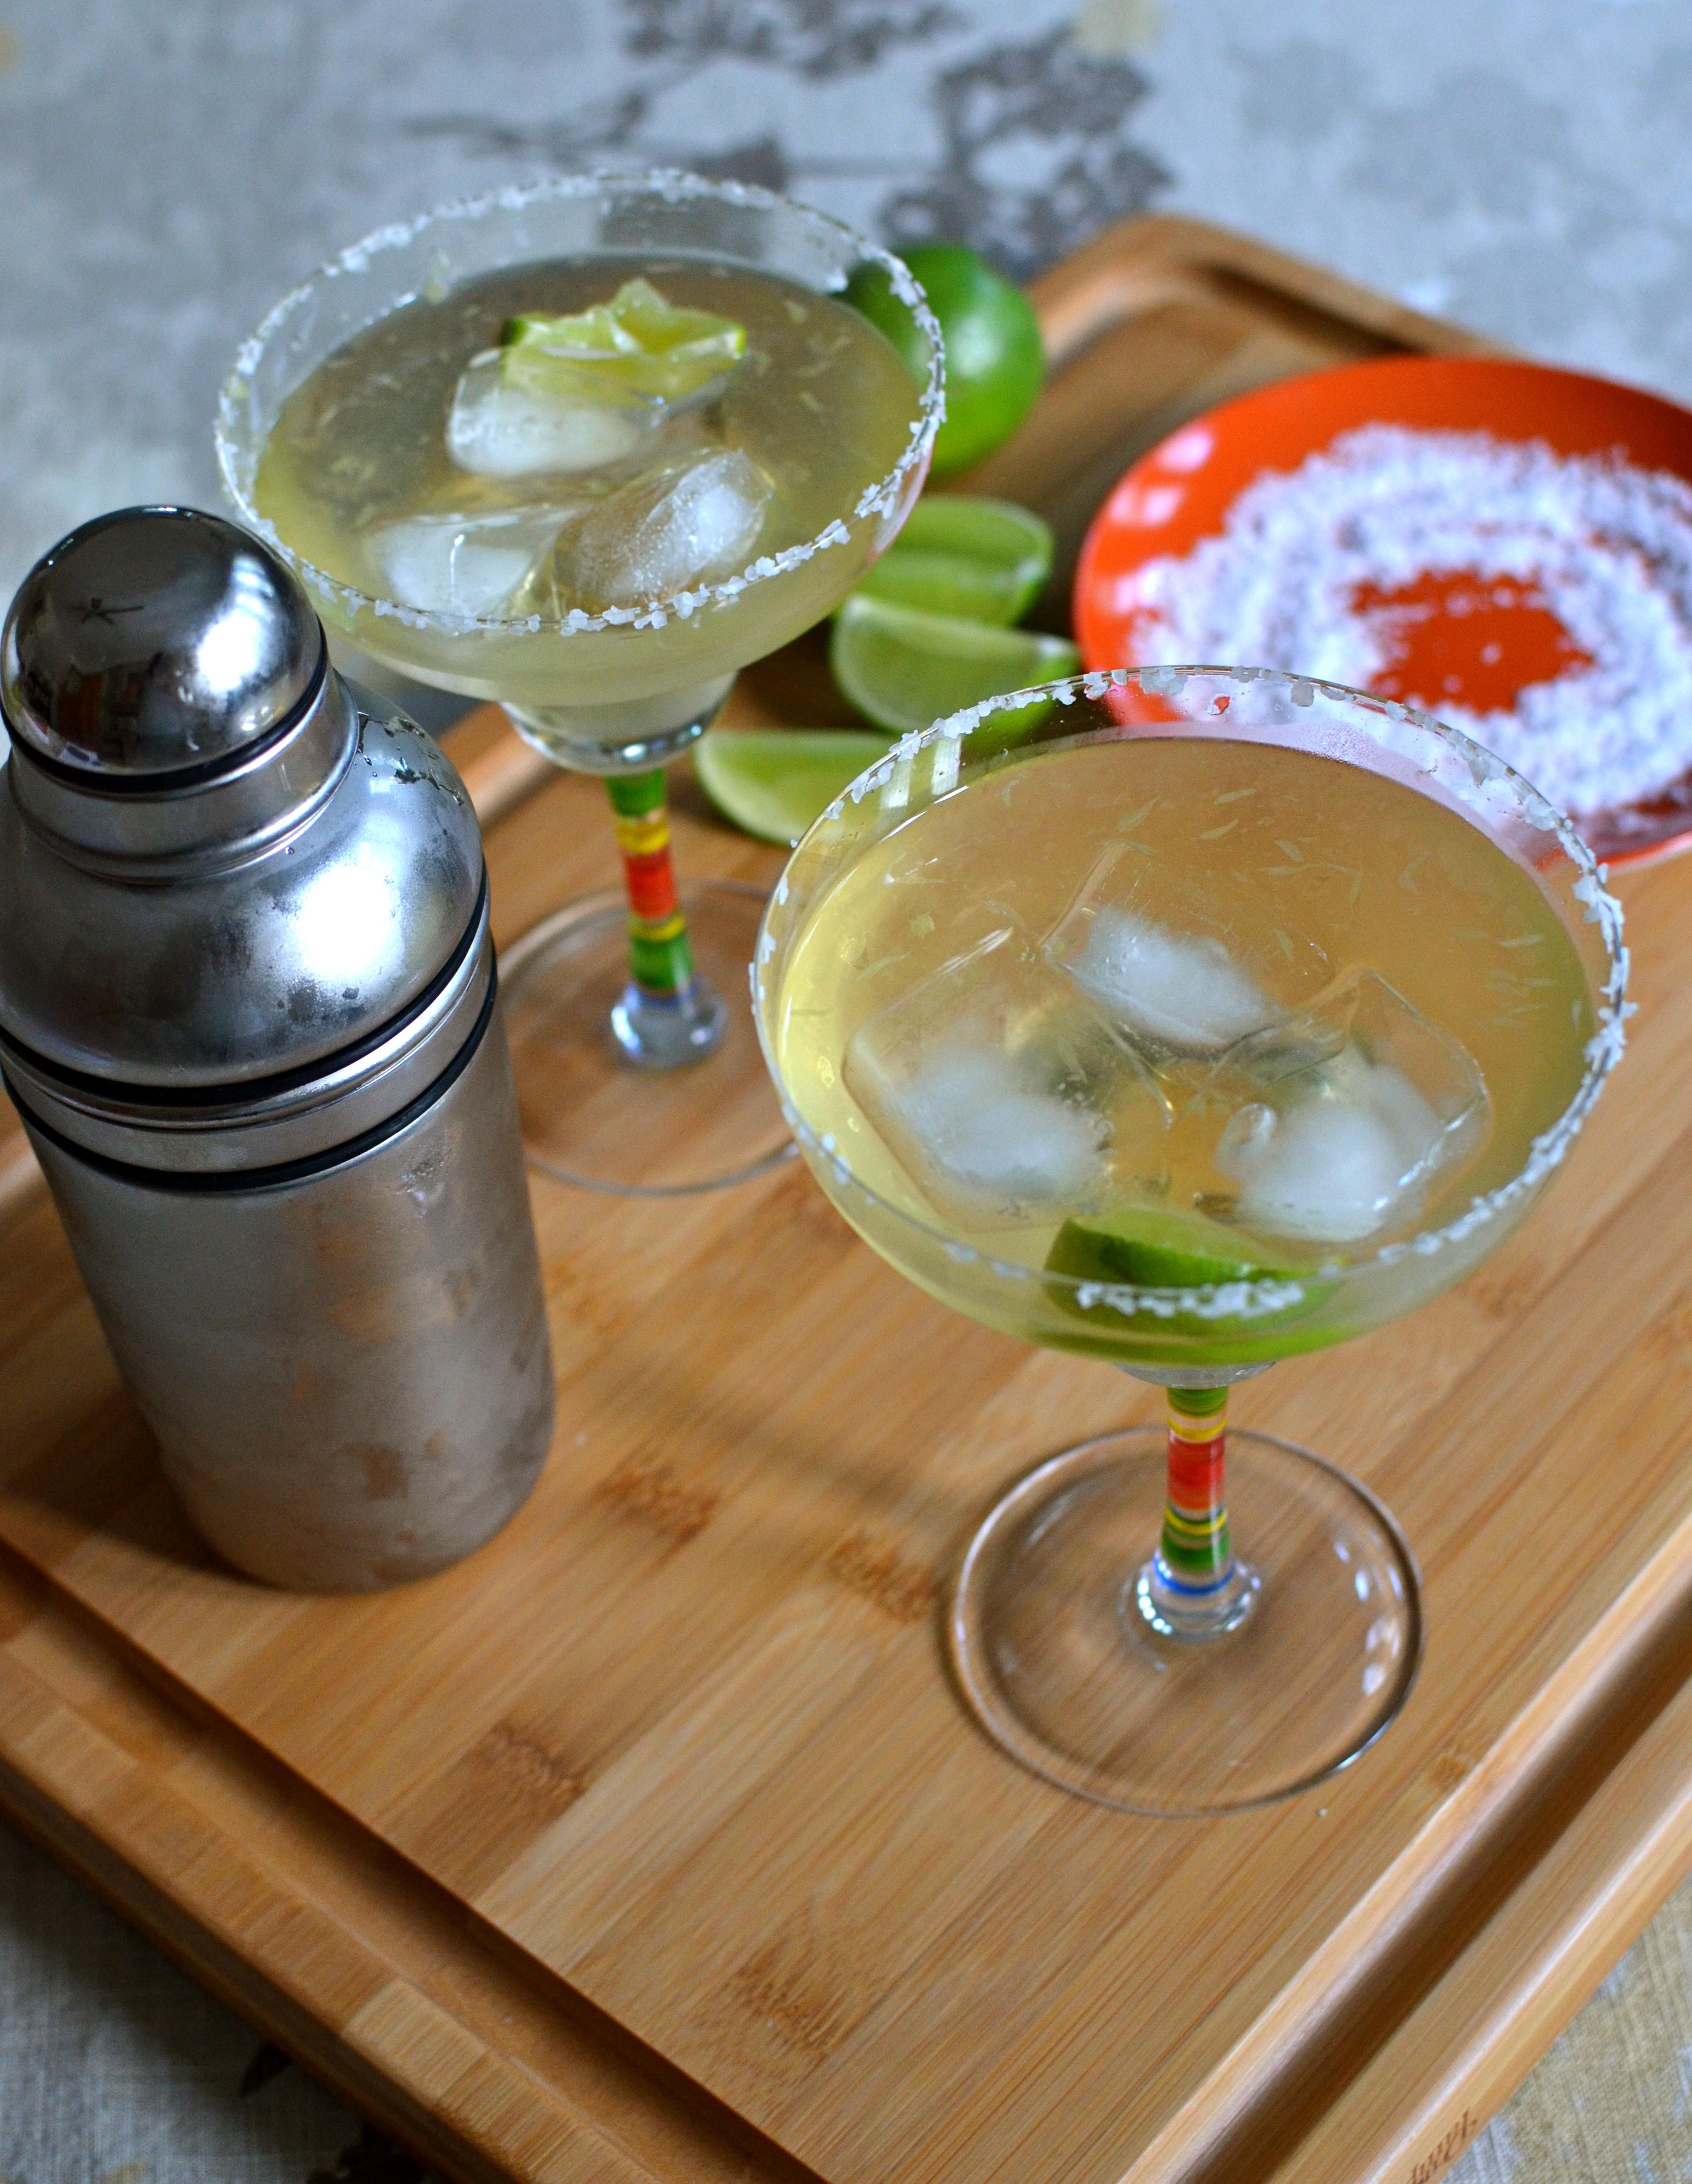 Rio margarita recipe | Celiac in the City